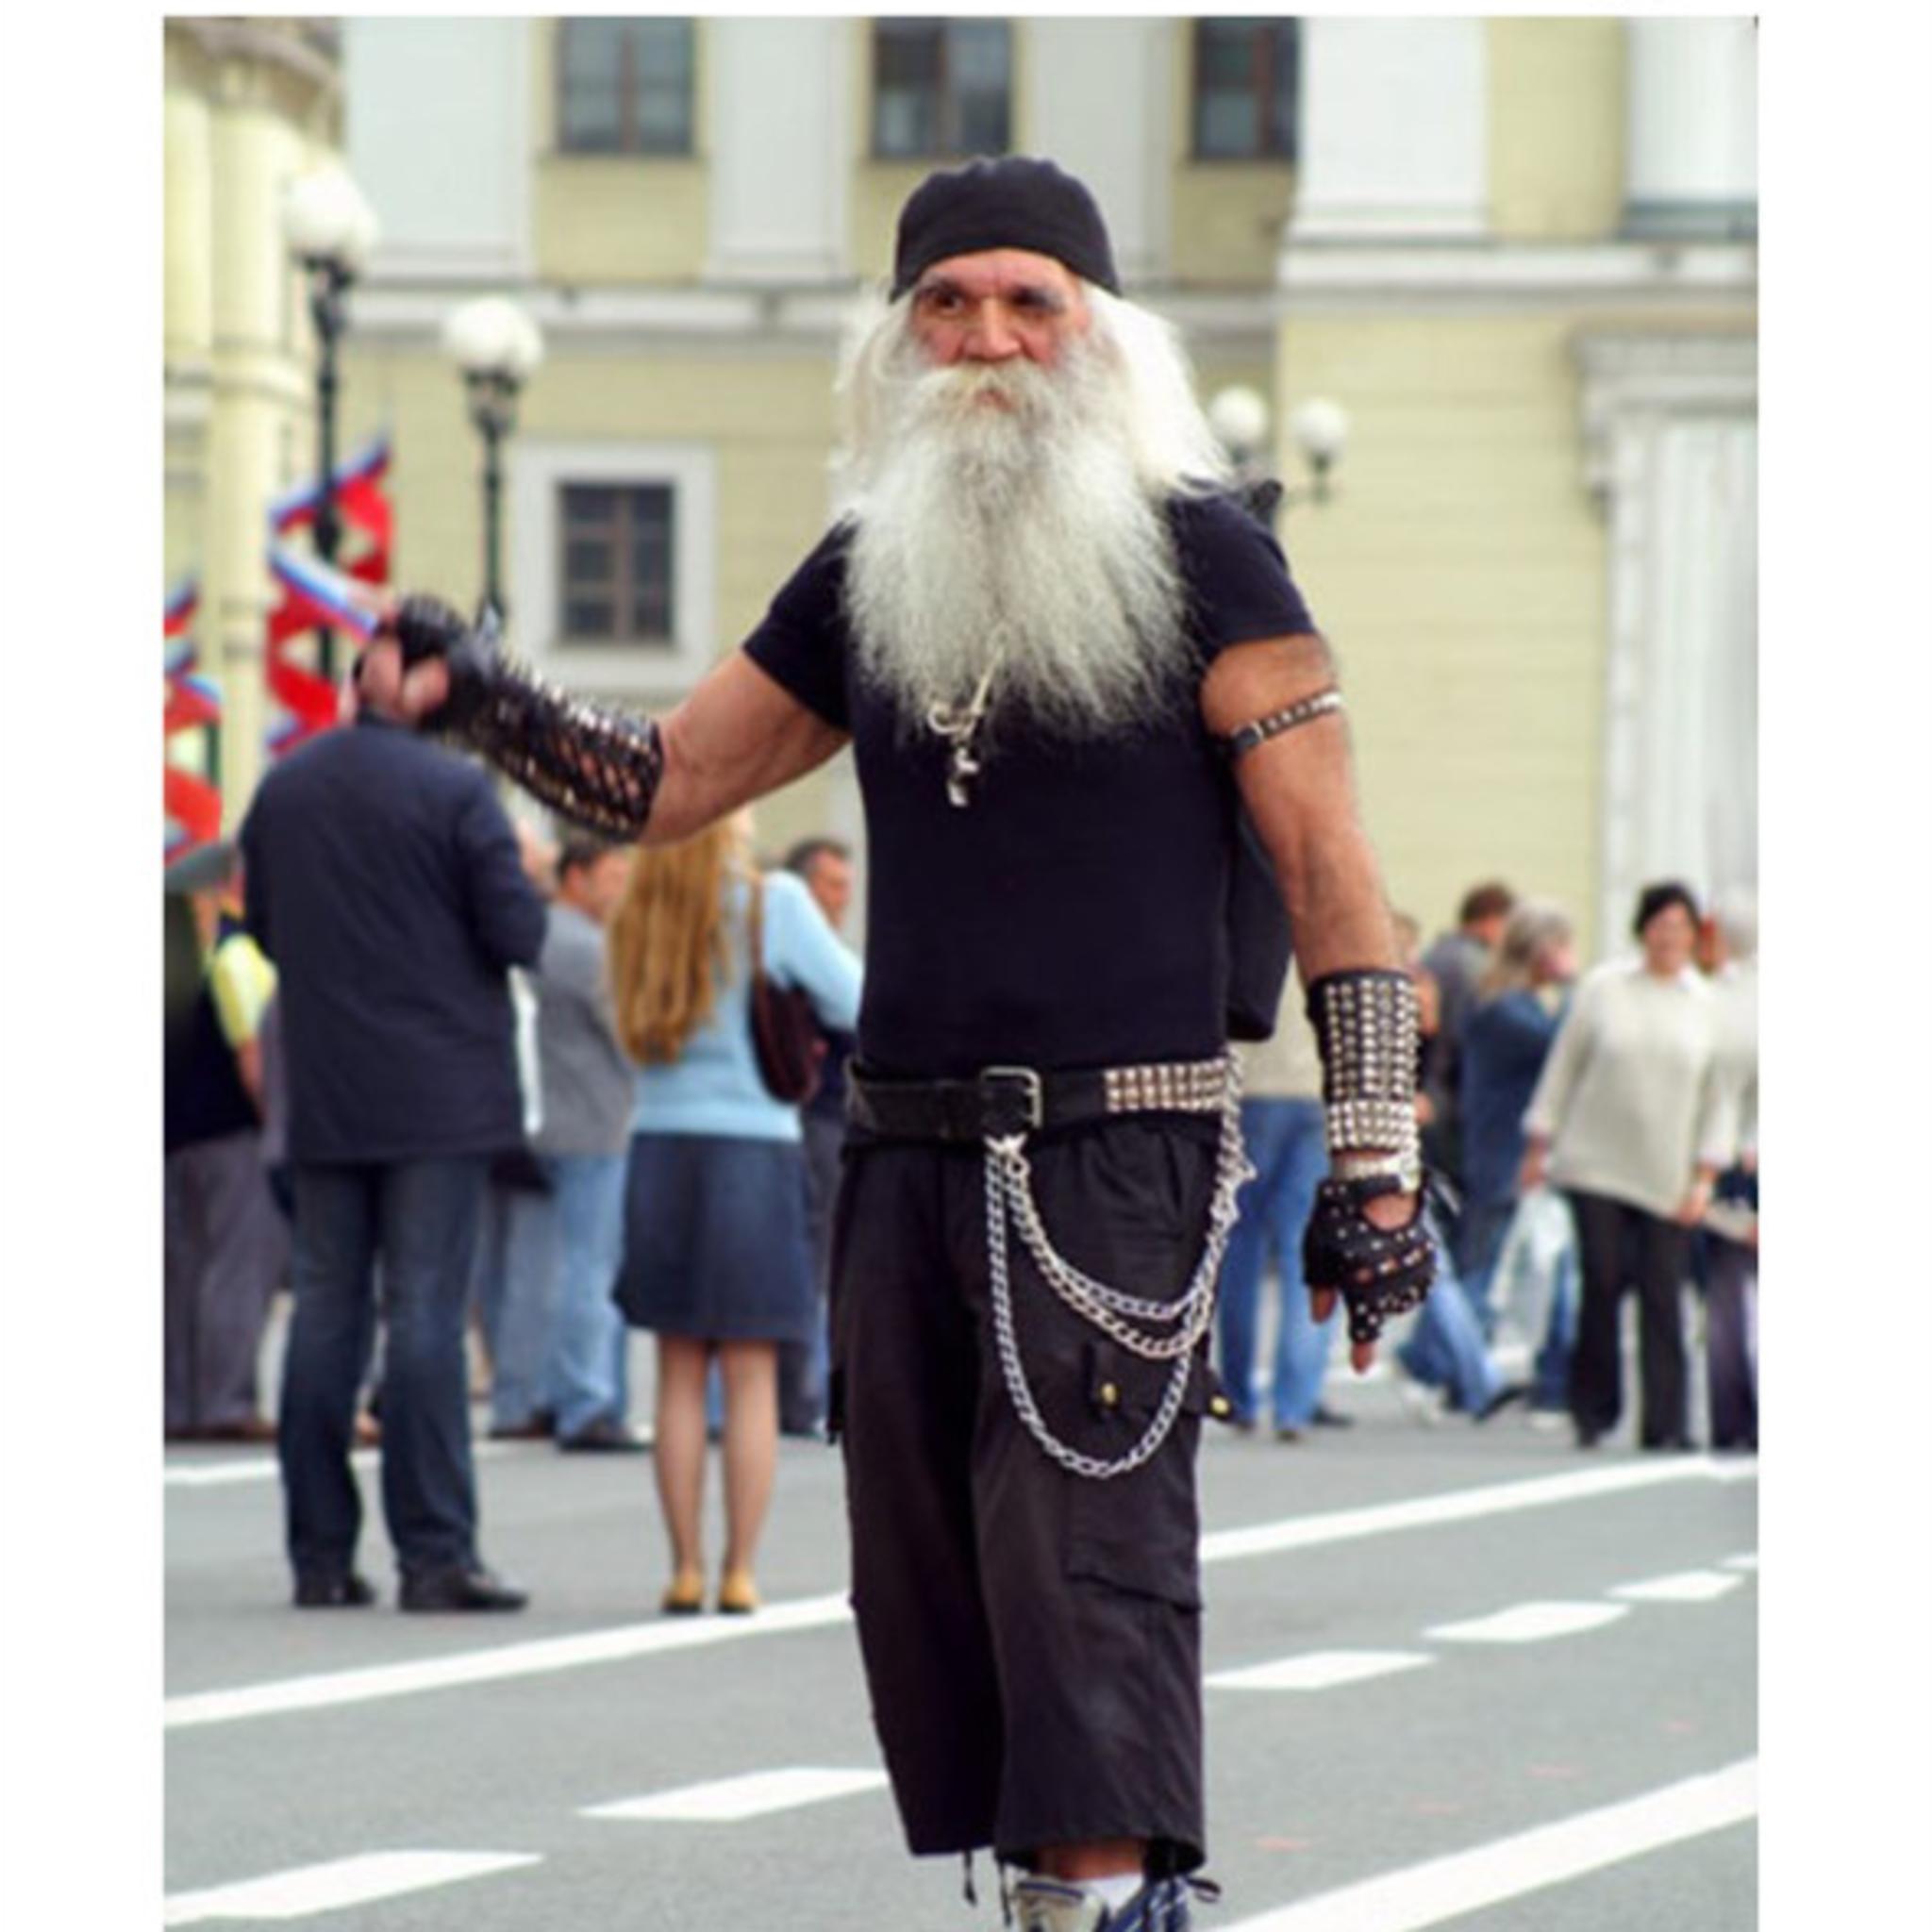 Exhibition of photographs MS Vspyshkin – Man City